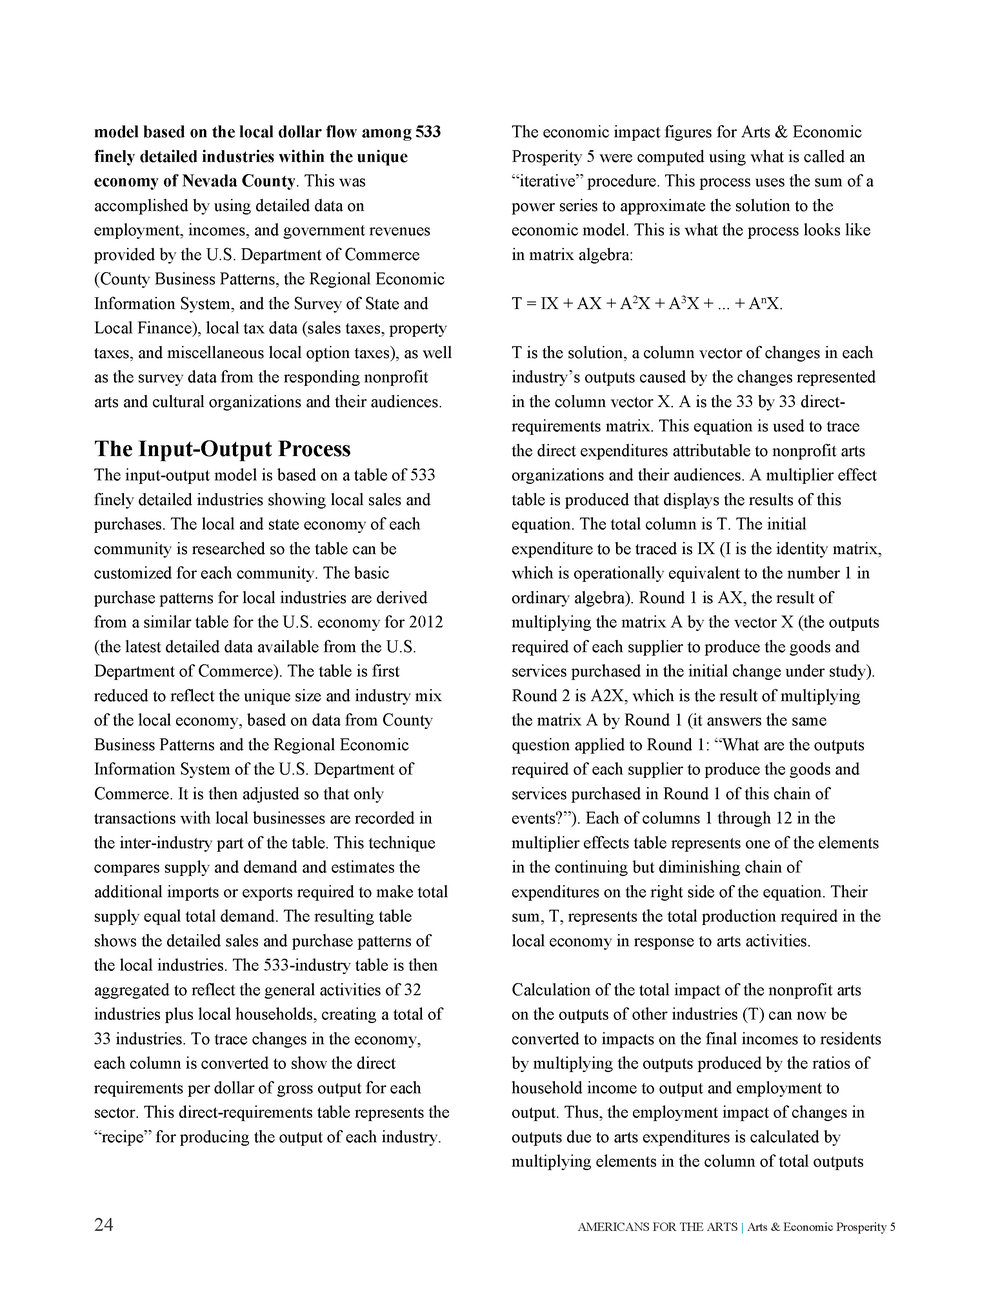 Arts & Economic Prosperity in Nevada County_Page_28.jpg